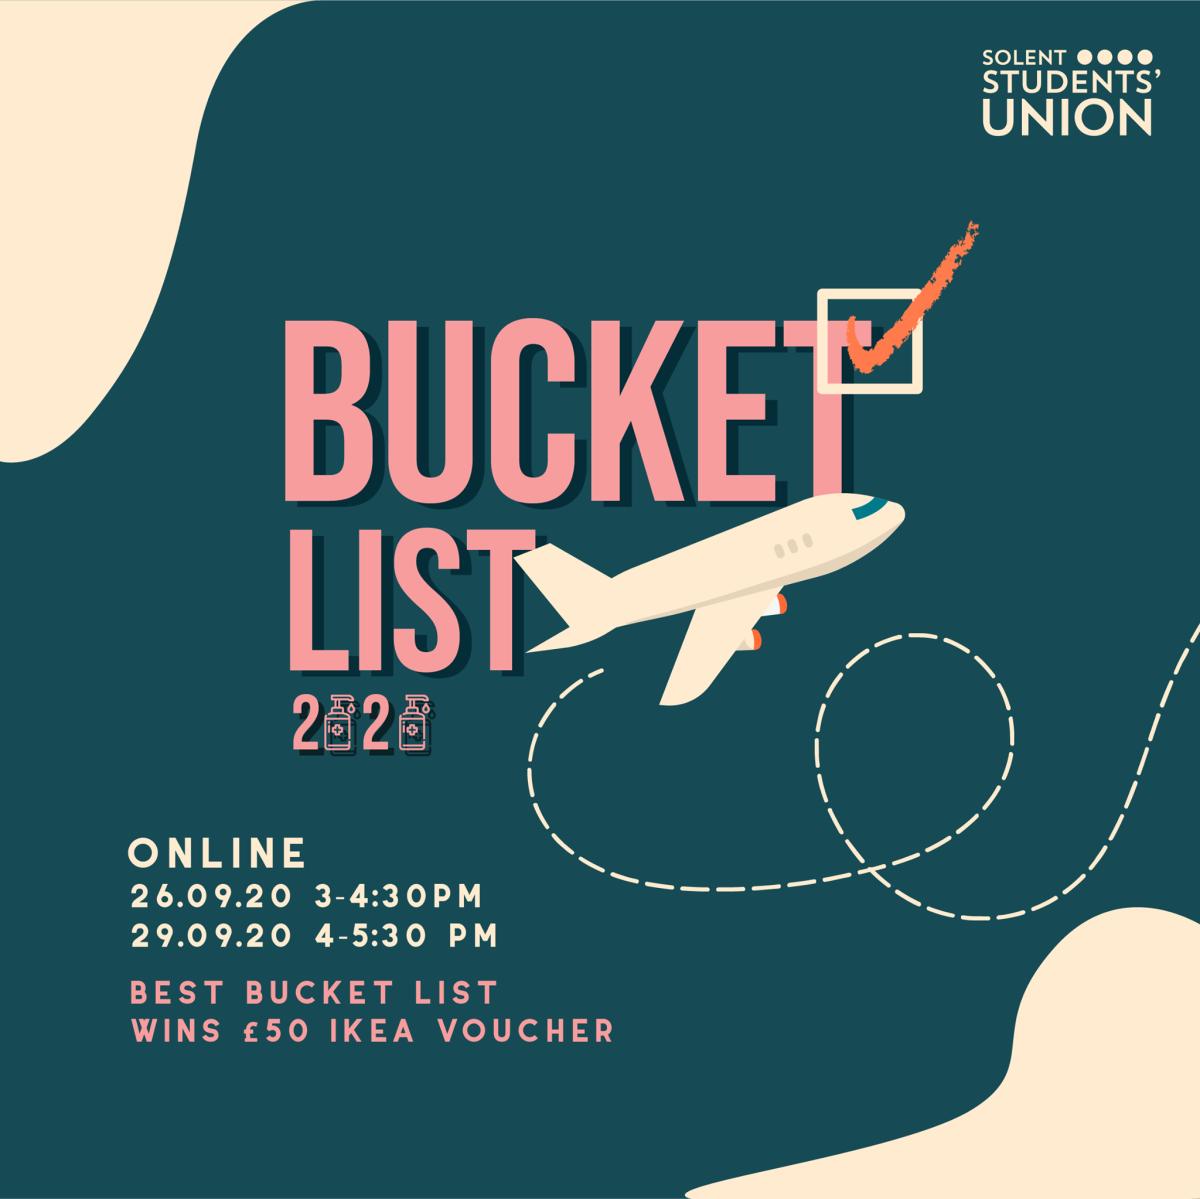 Bucket List Event